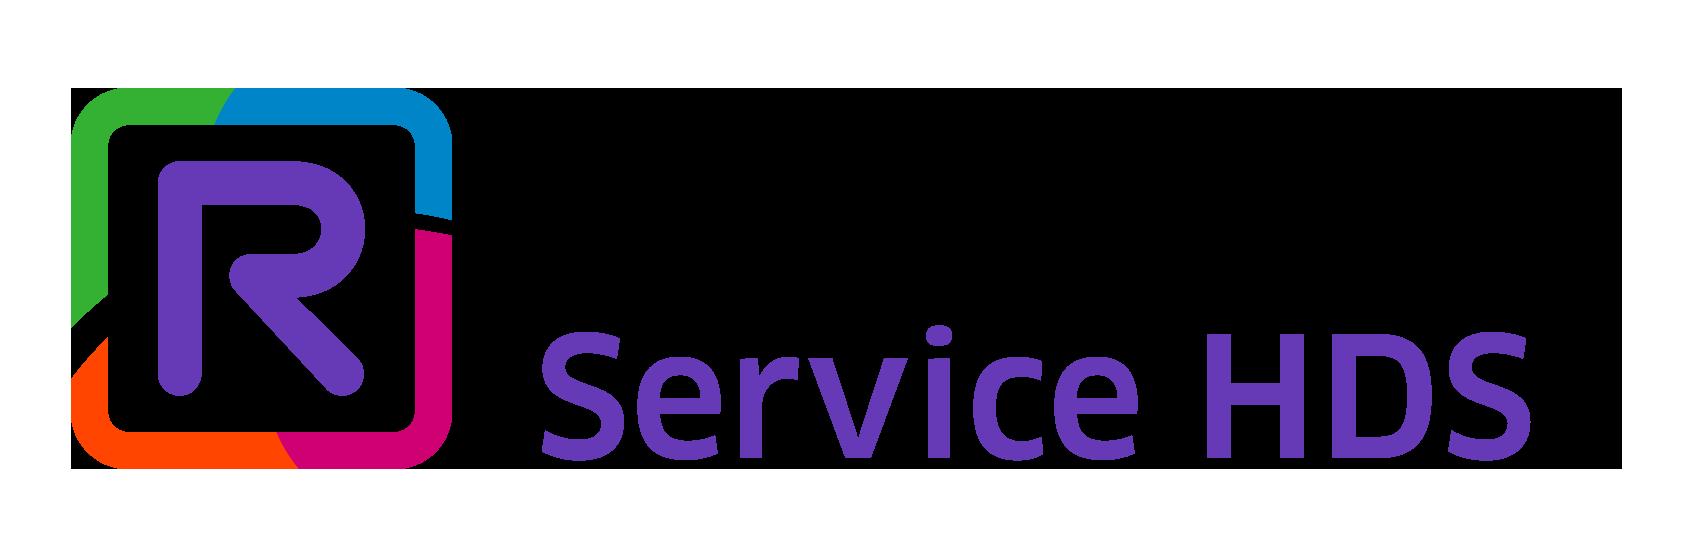 Rainbow Service HDS (purple) logo FR